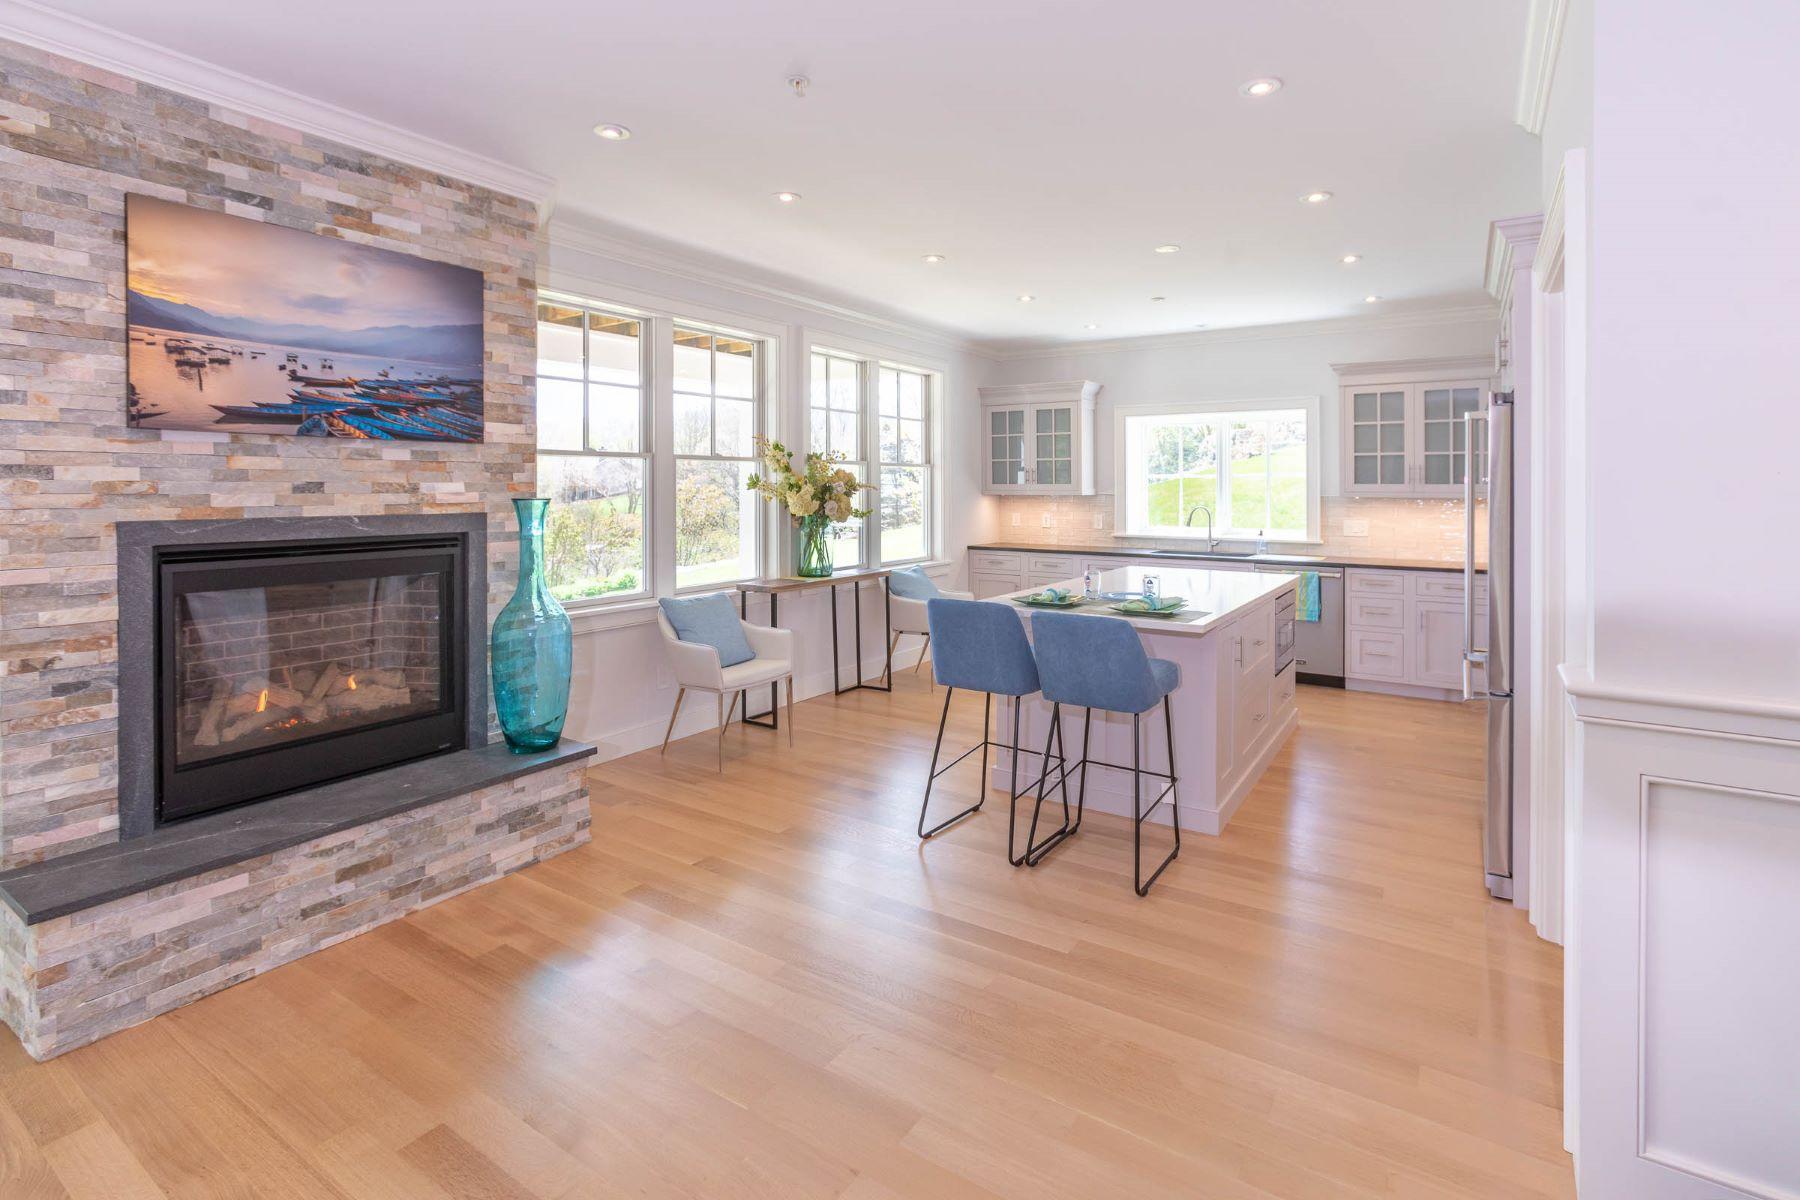 Additional photo for property listing at 361 Woodruff Avenue, #E, South Kingstown, RI 361 Woodruff Avenue, E South Kingstown, Rhode Island 02879 United States